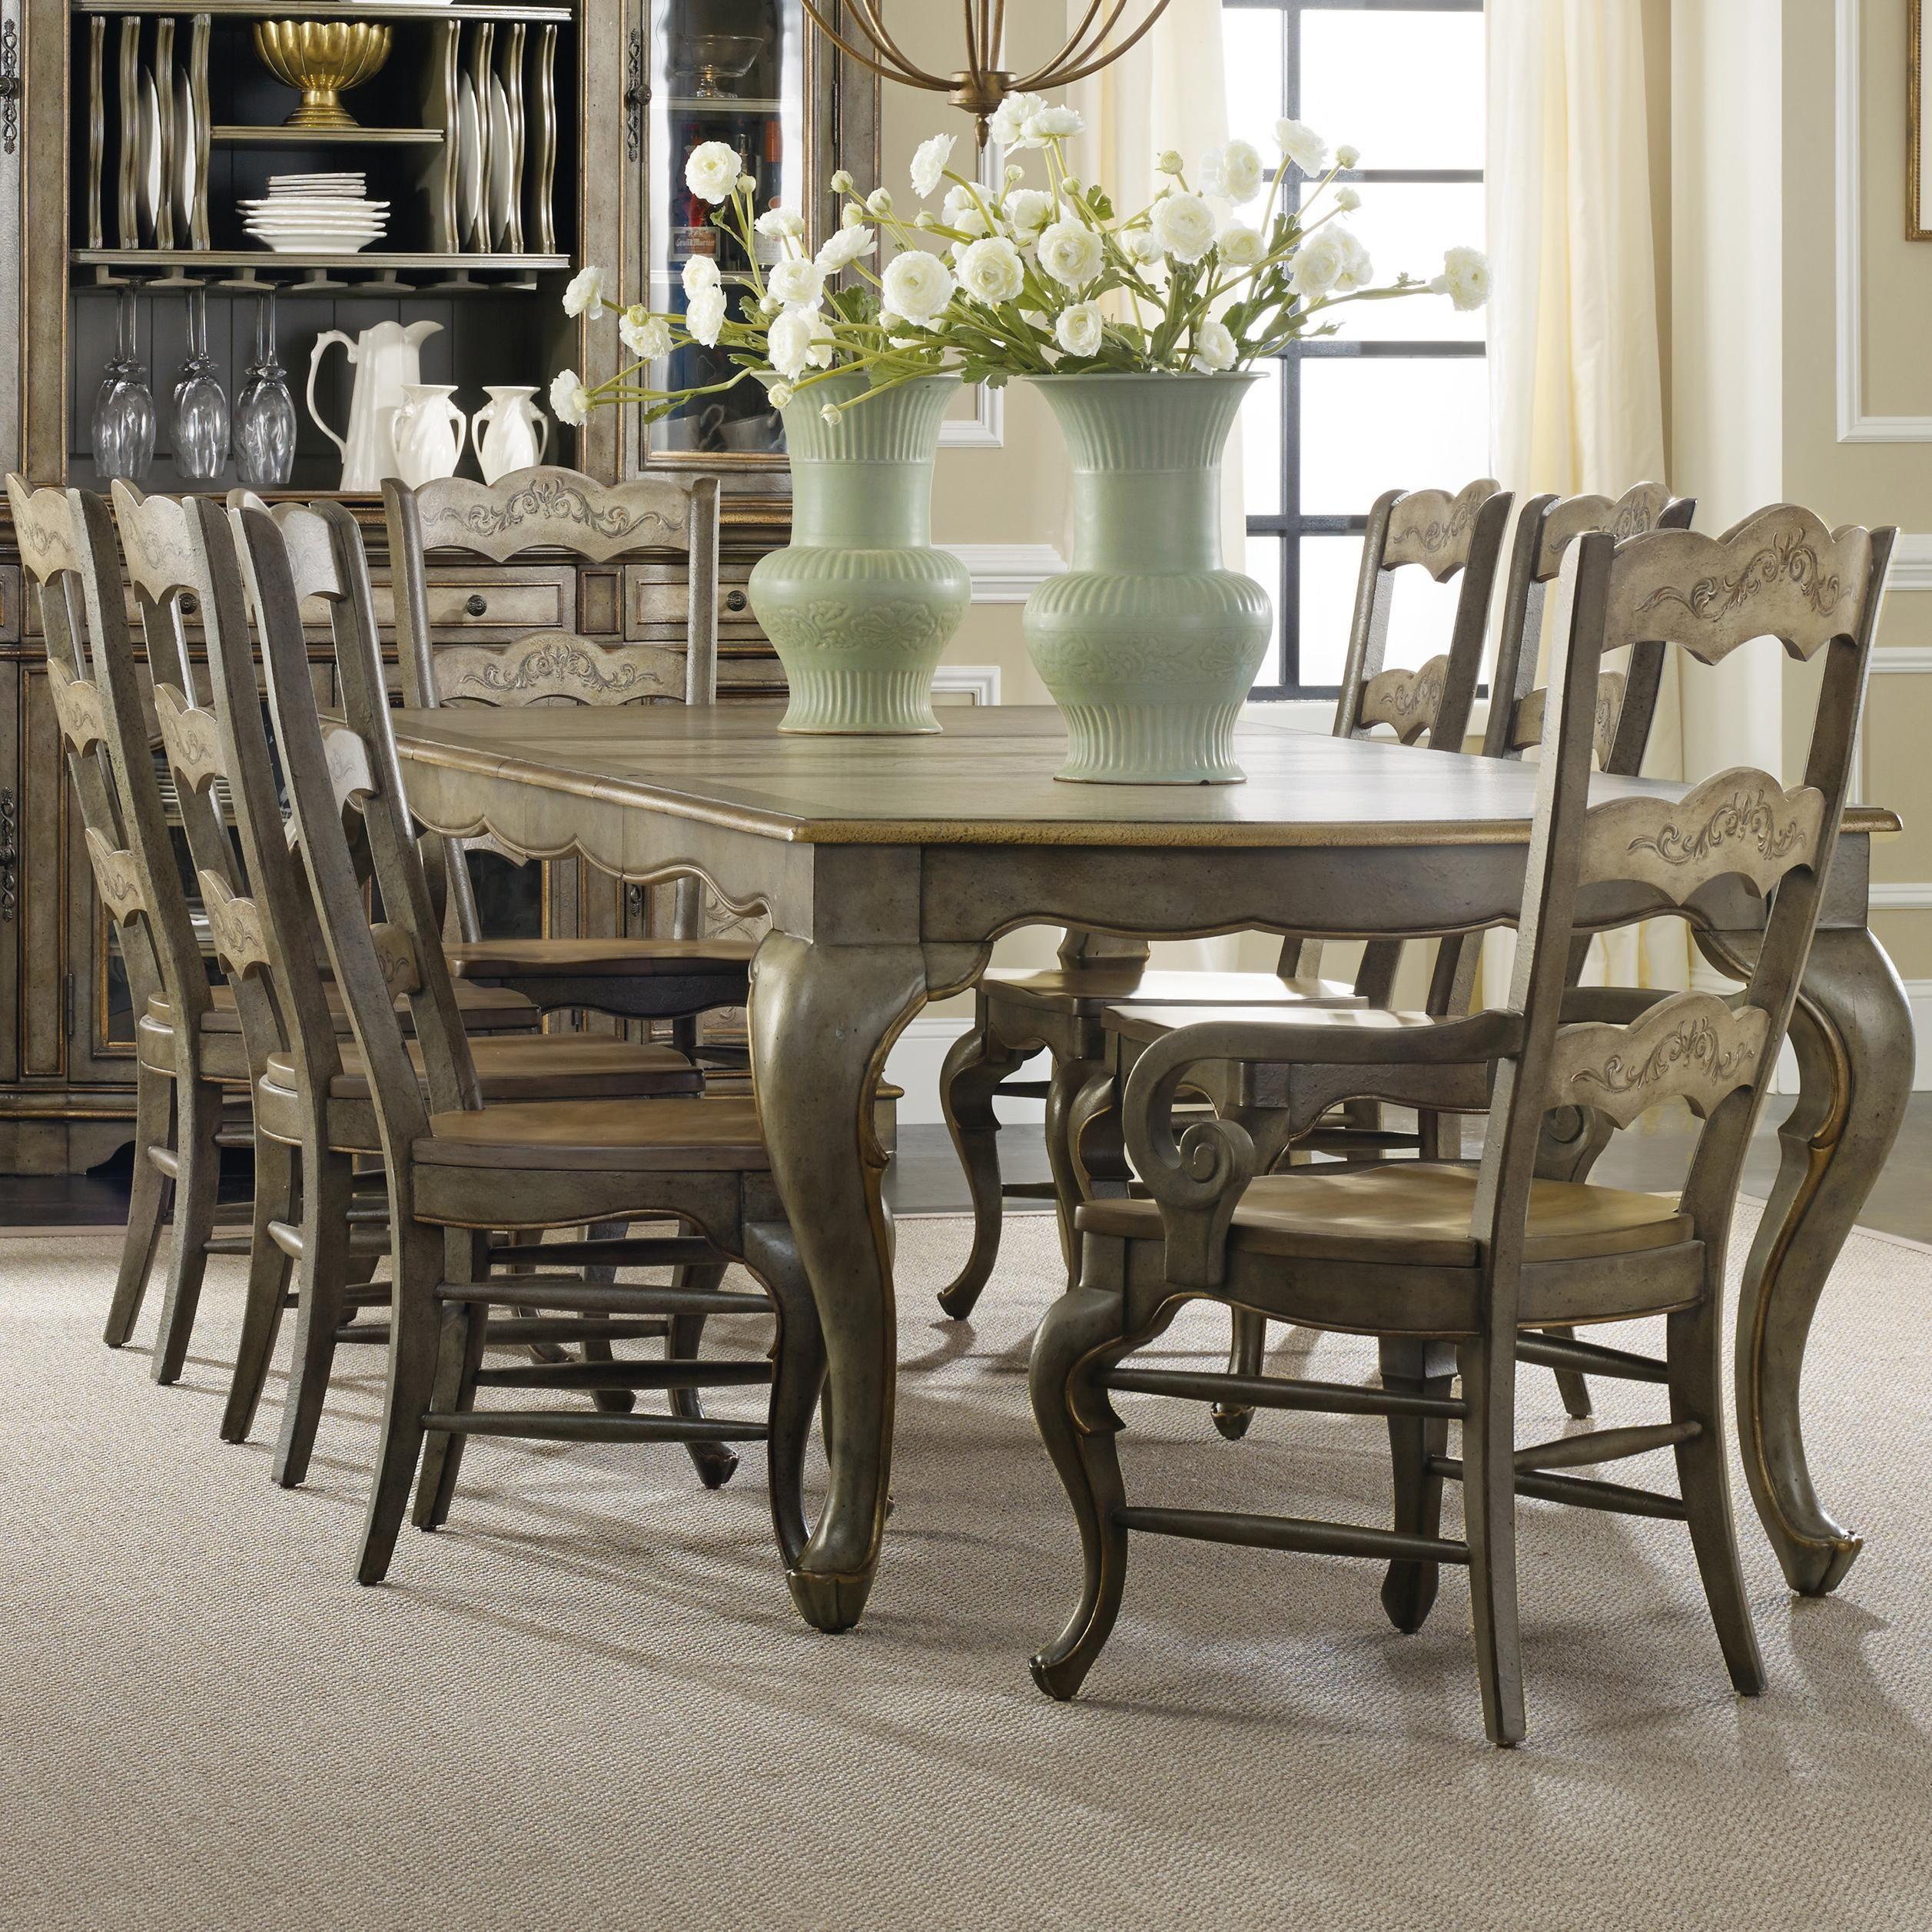 Attractive Room · Hooker Furniture ... Design